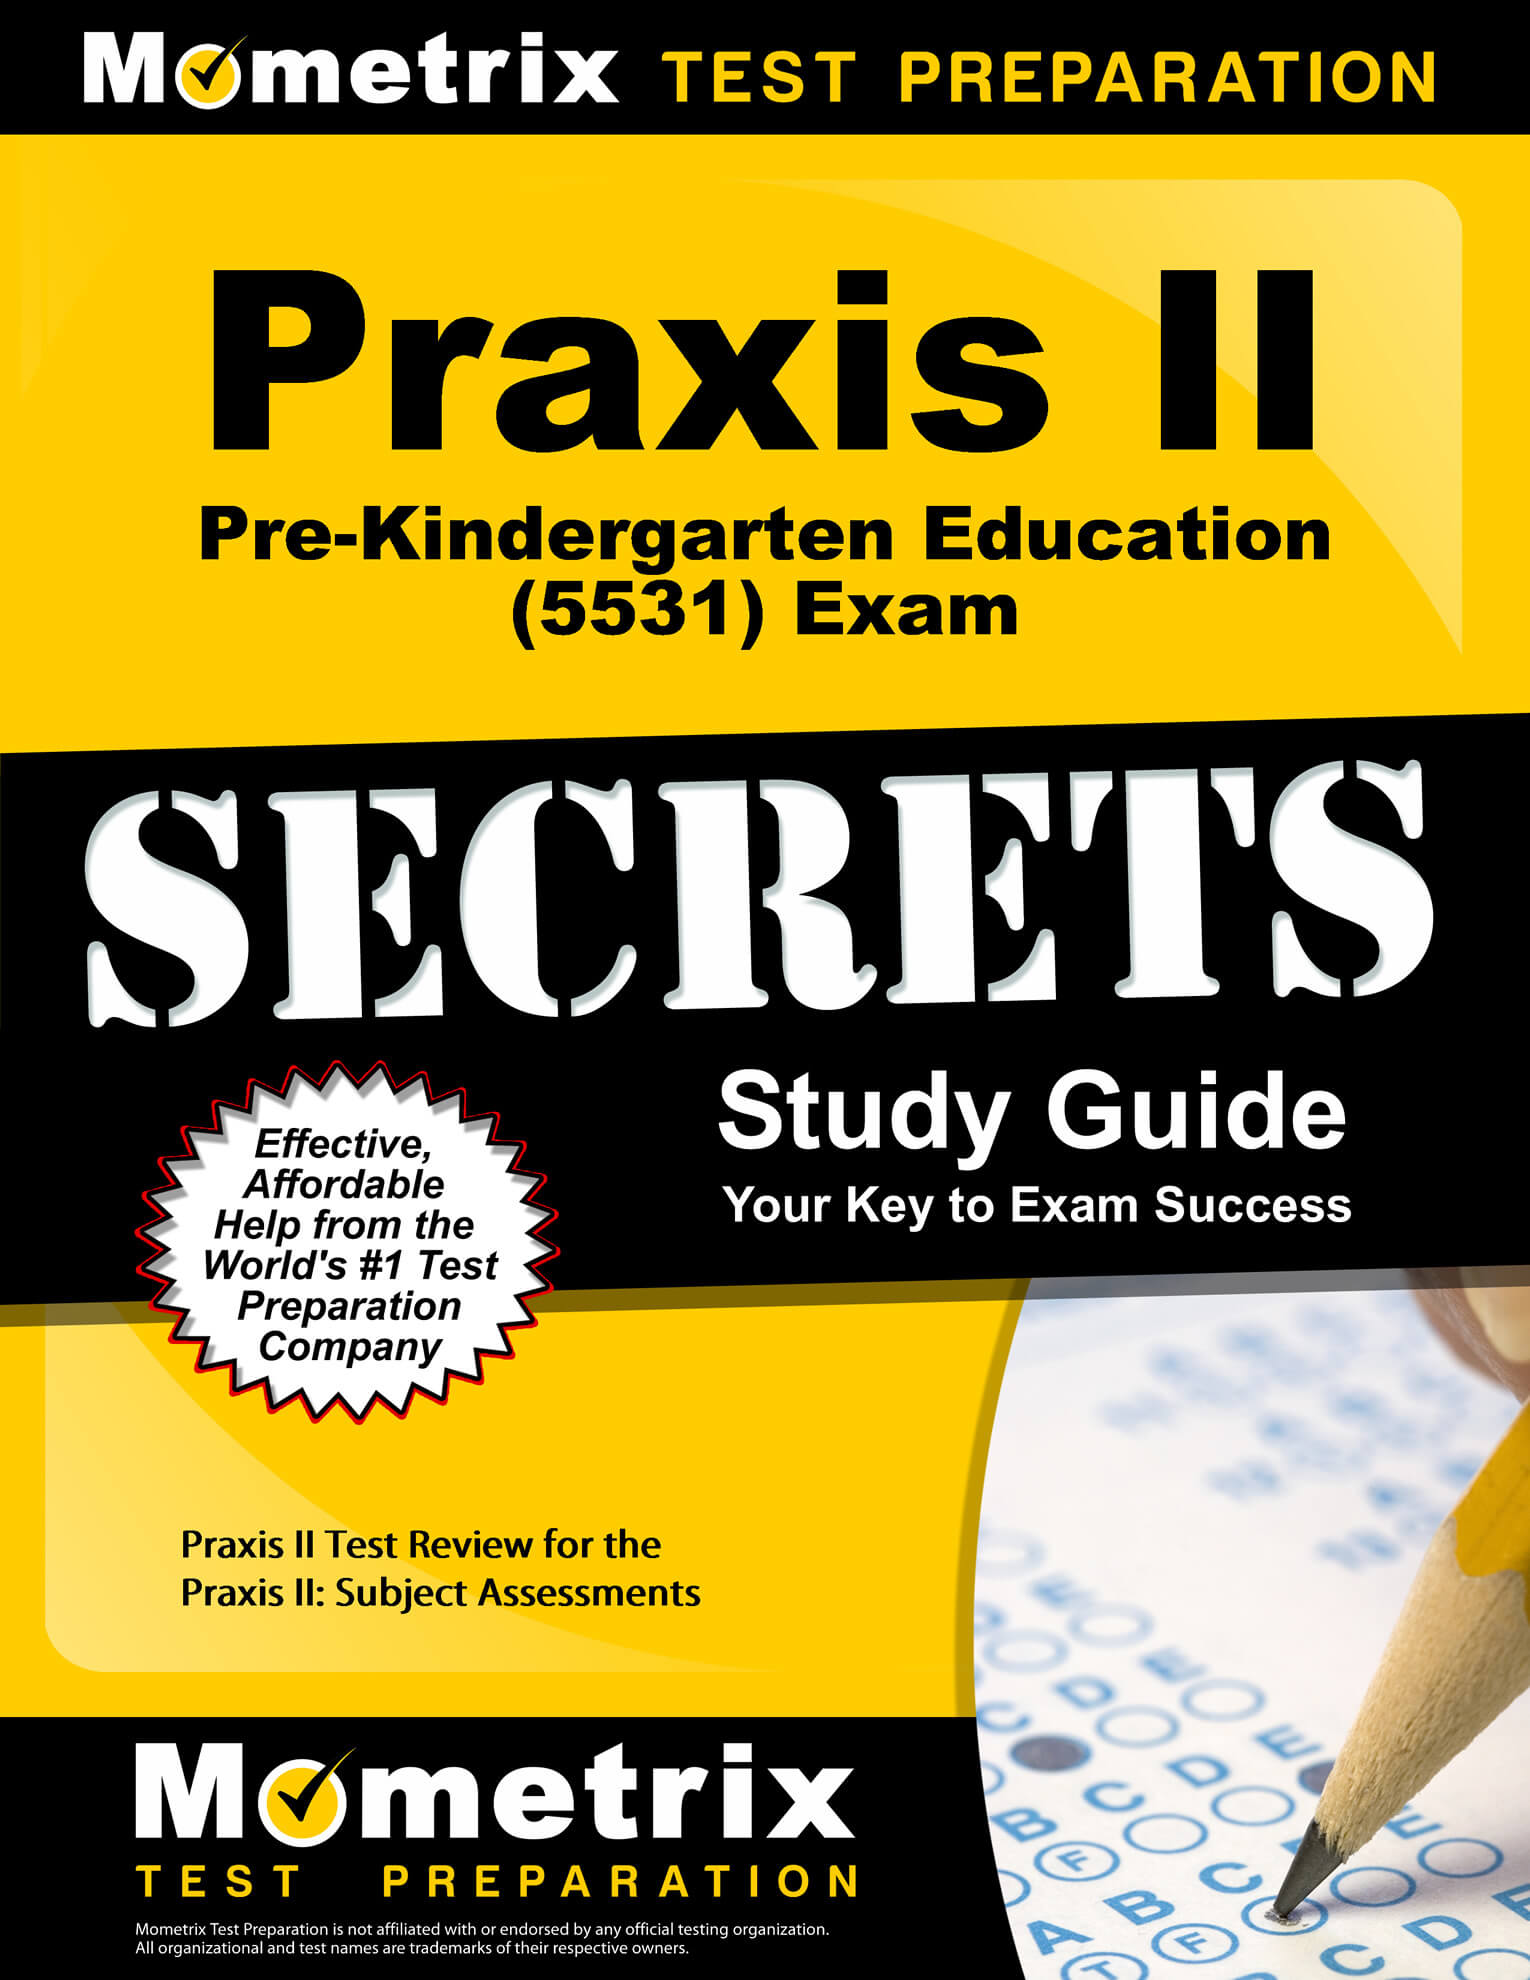 Praxis II Pre-Kindergarten Education Study Guide